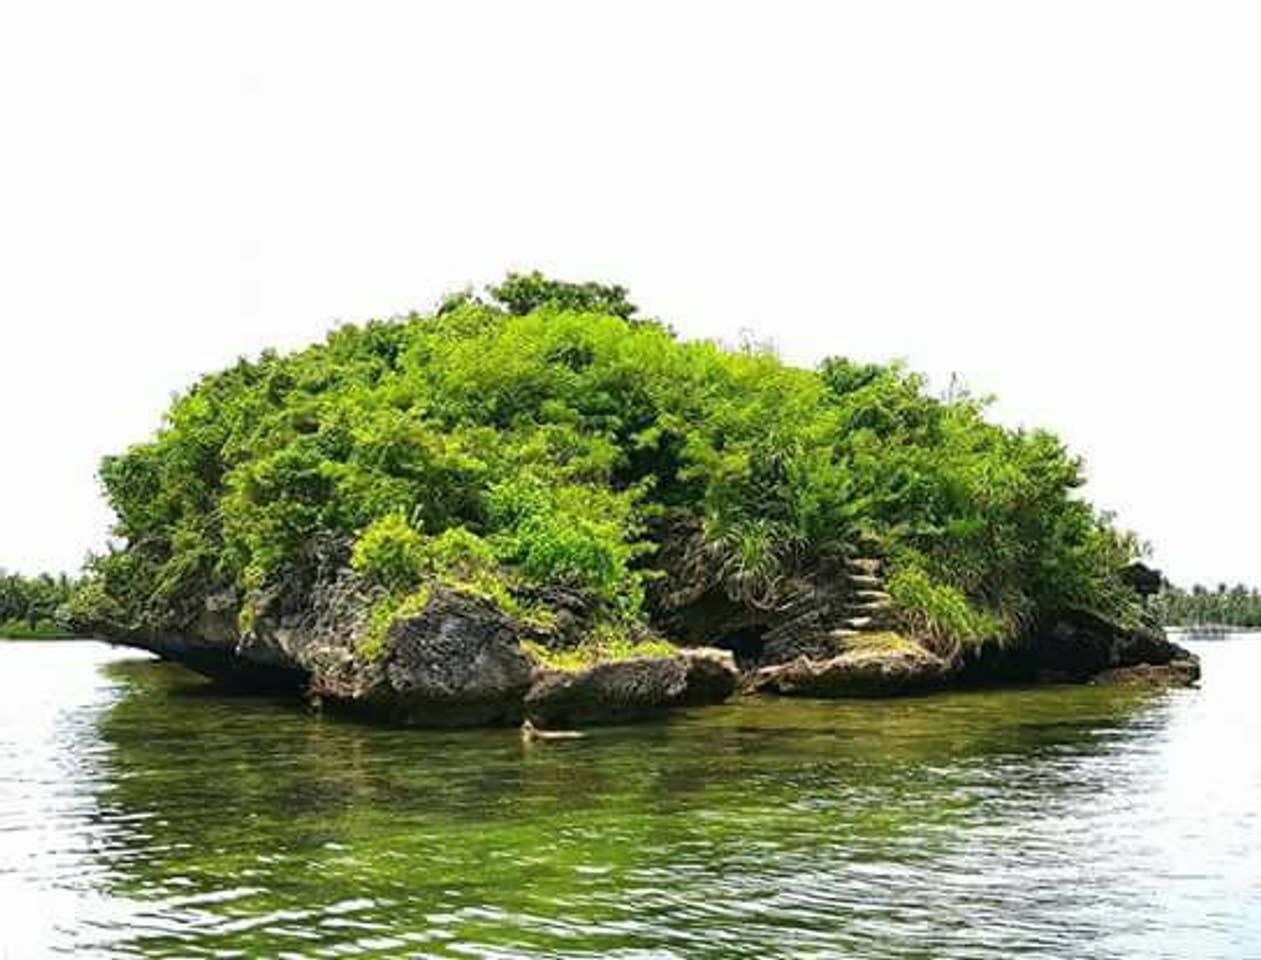 Boli Hai private island, Tres Marias Islands, Philippines